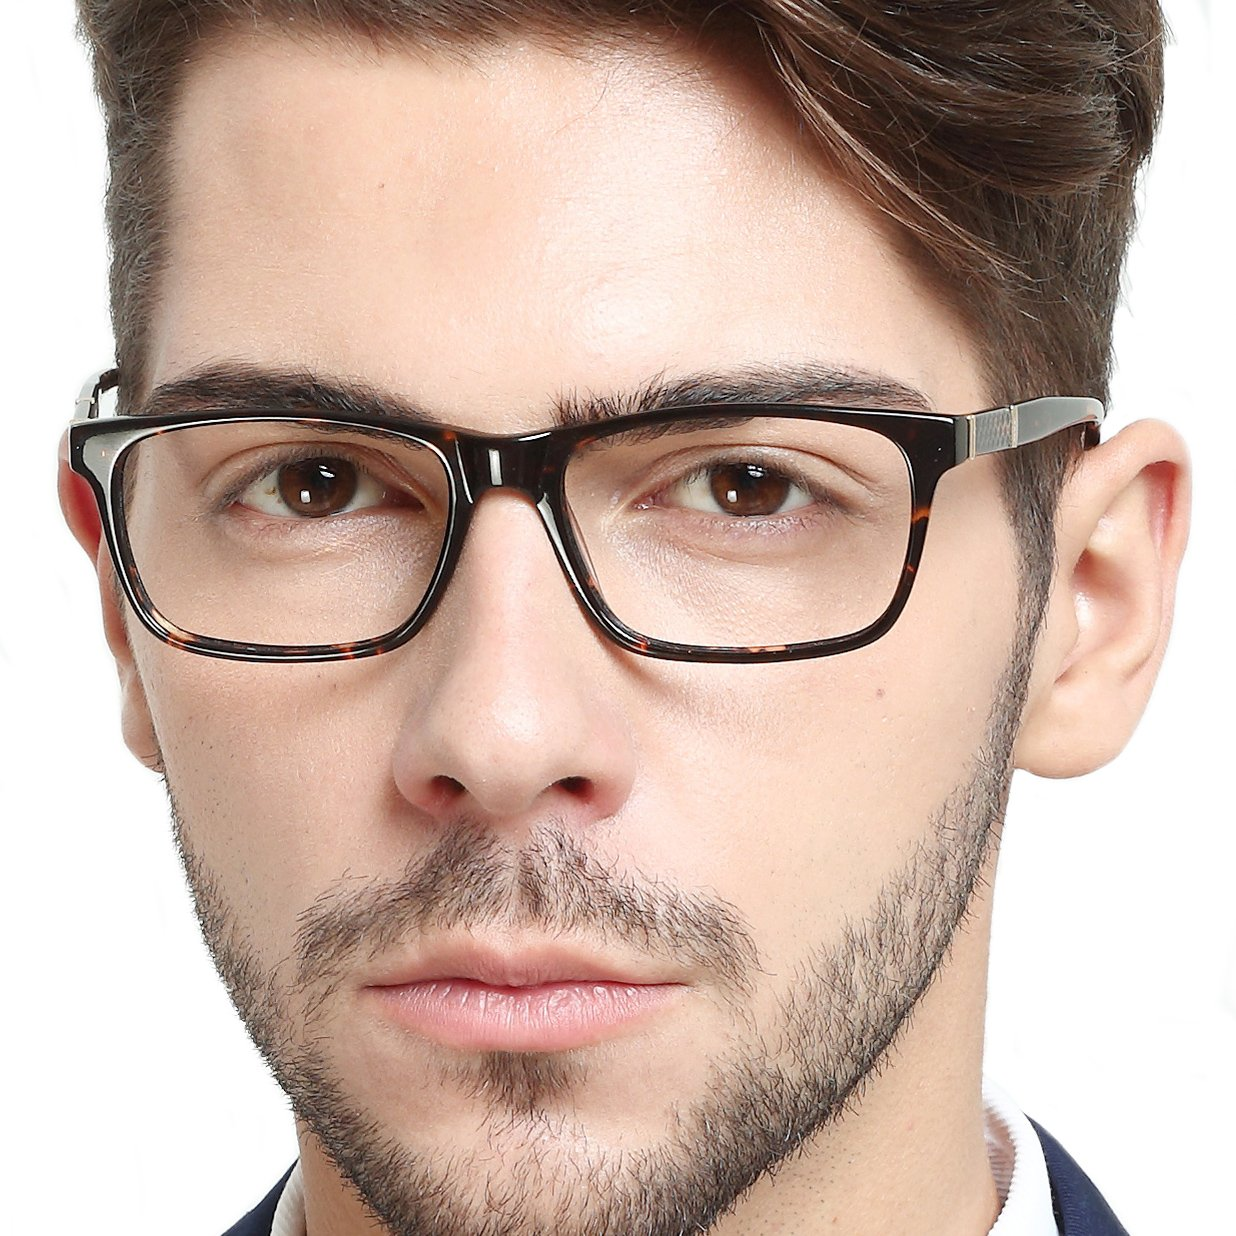 6f30a30d684 OCCI CHIARI Men Fashion Rectangle Stylish Eyewear Frame With Non-Prescription  Clear Lens 54)